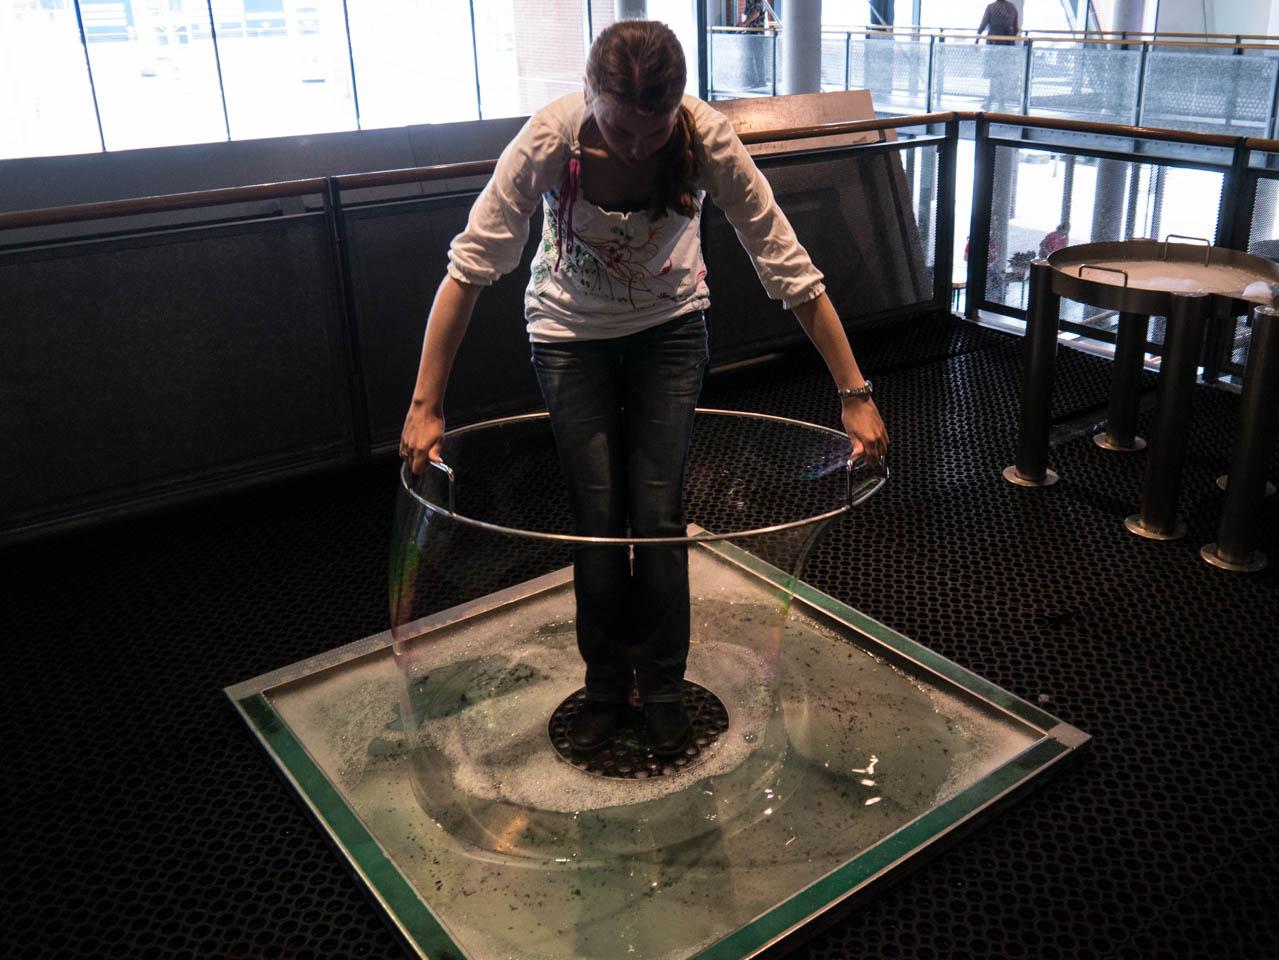 seifenblasenexperiment-1-von-1